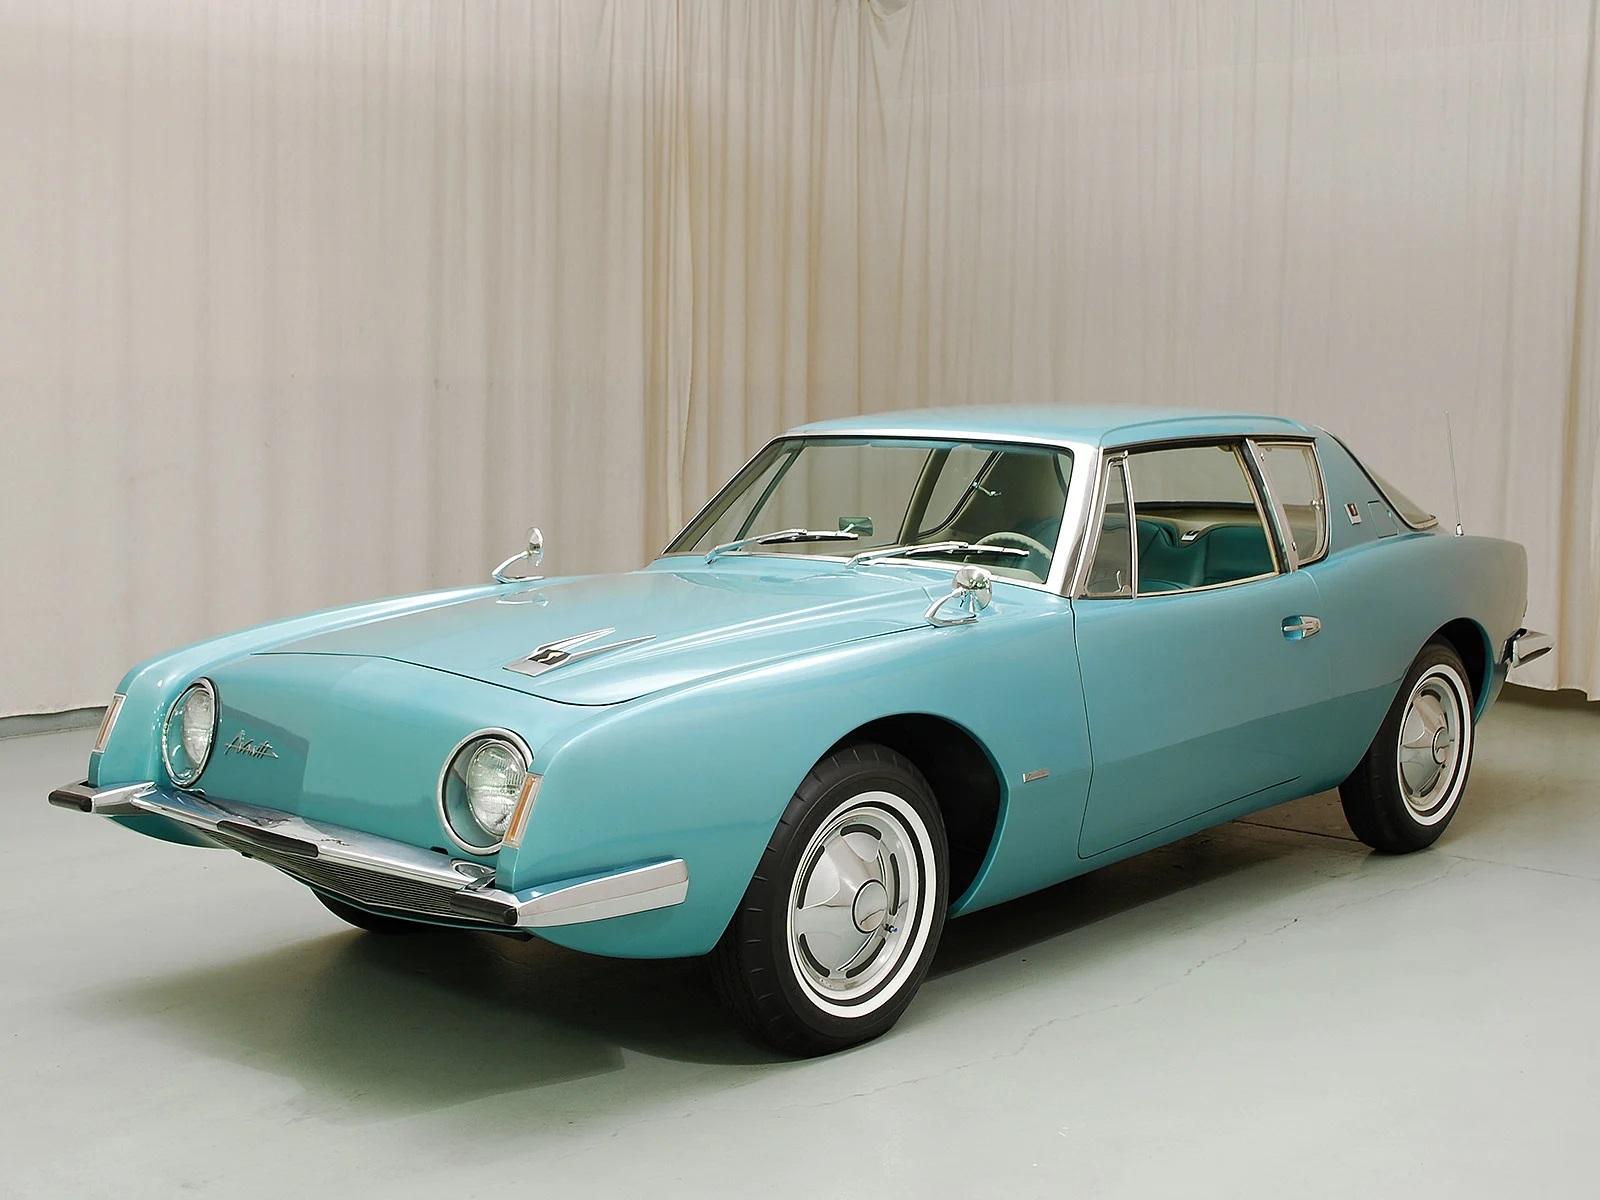 1962 Studebaker Avanti